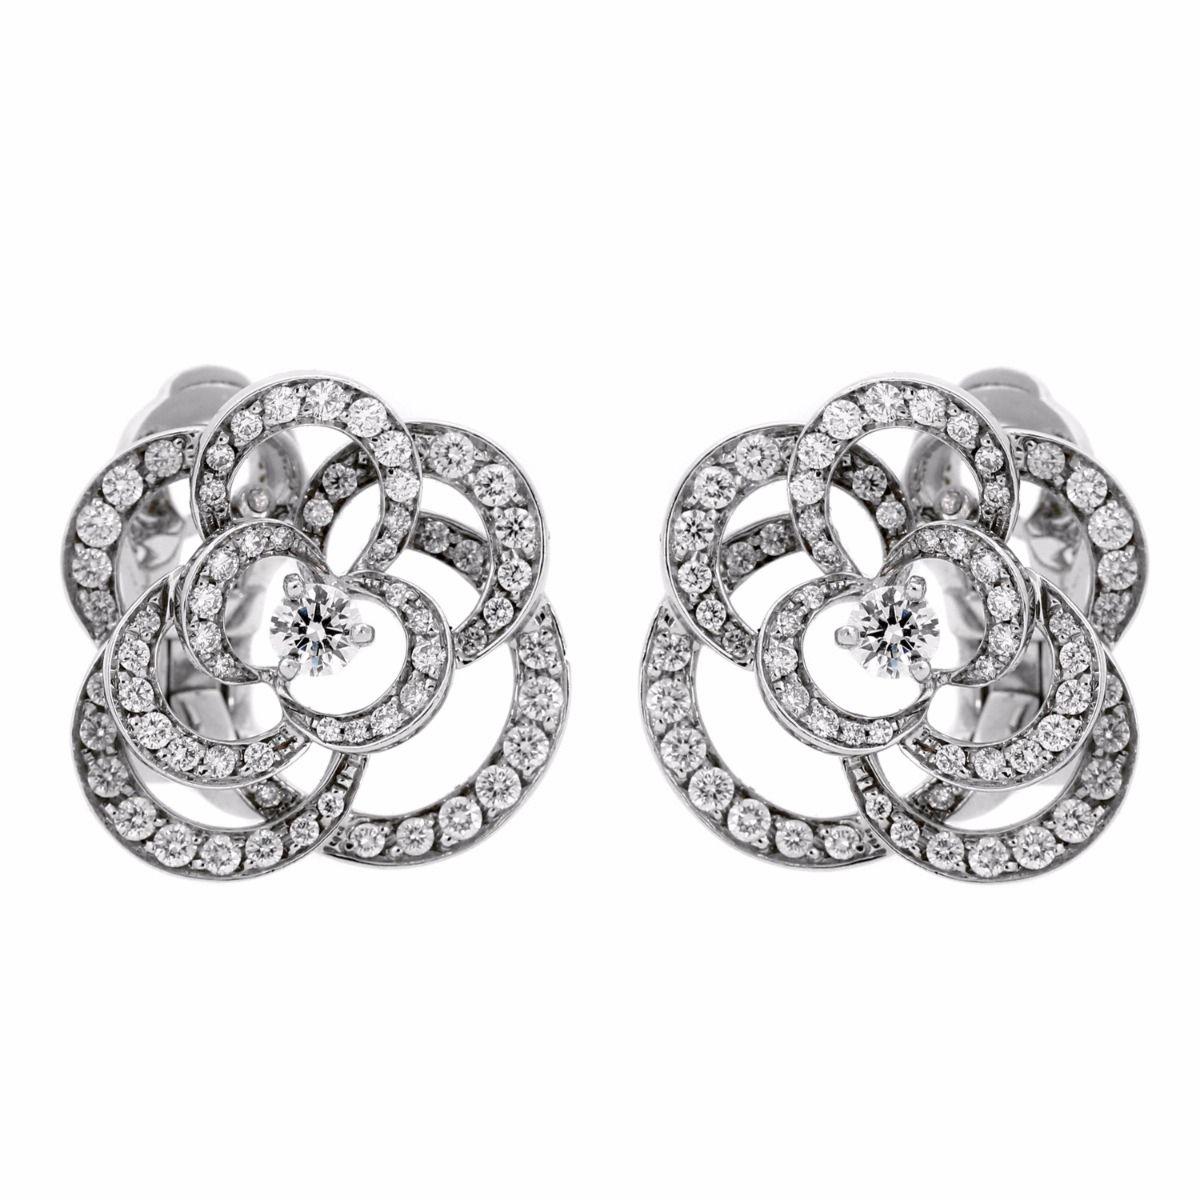 f7e0e5468 Chanel Camellia Flower Diamond Earrings | Opulent Jewelers |  OpulentJewelers.com #Flowers#